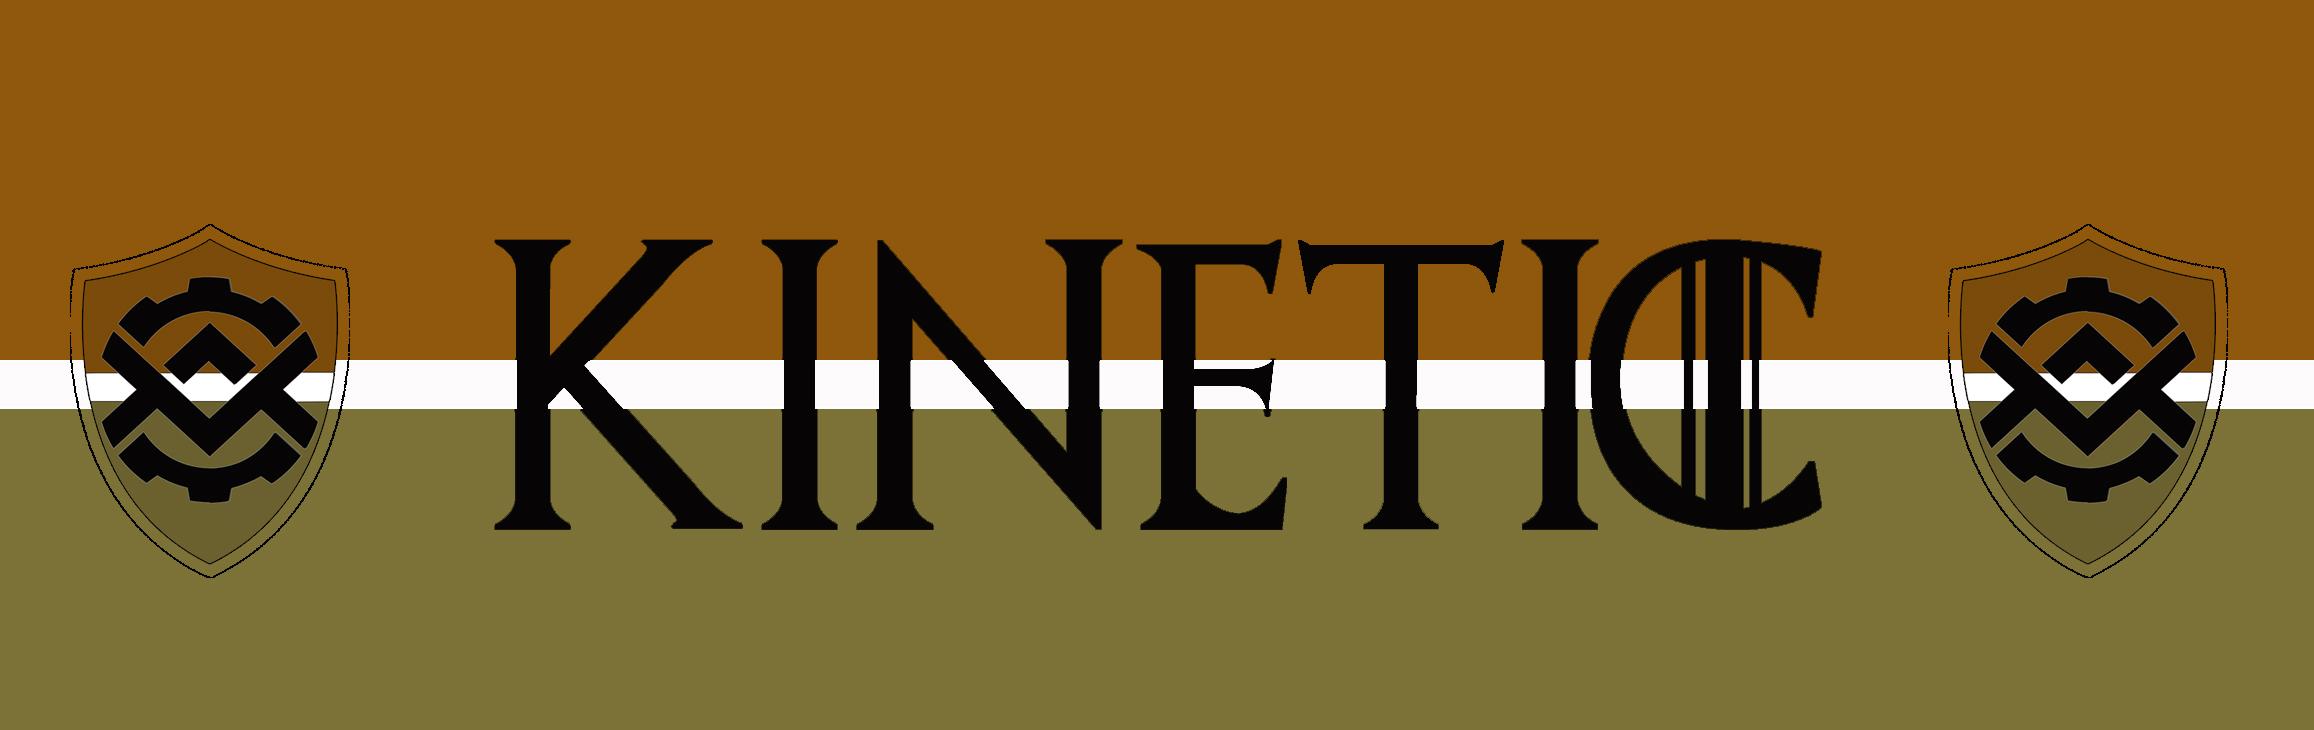 House Kinetic - Kinetic Development Group